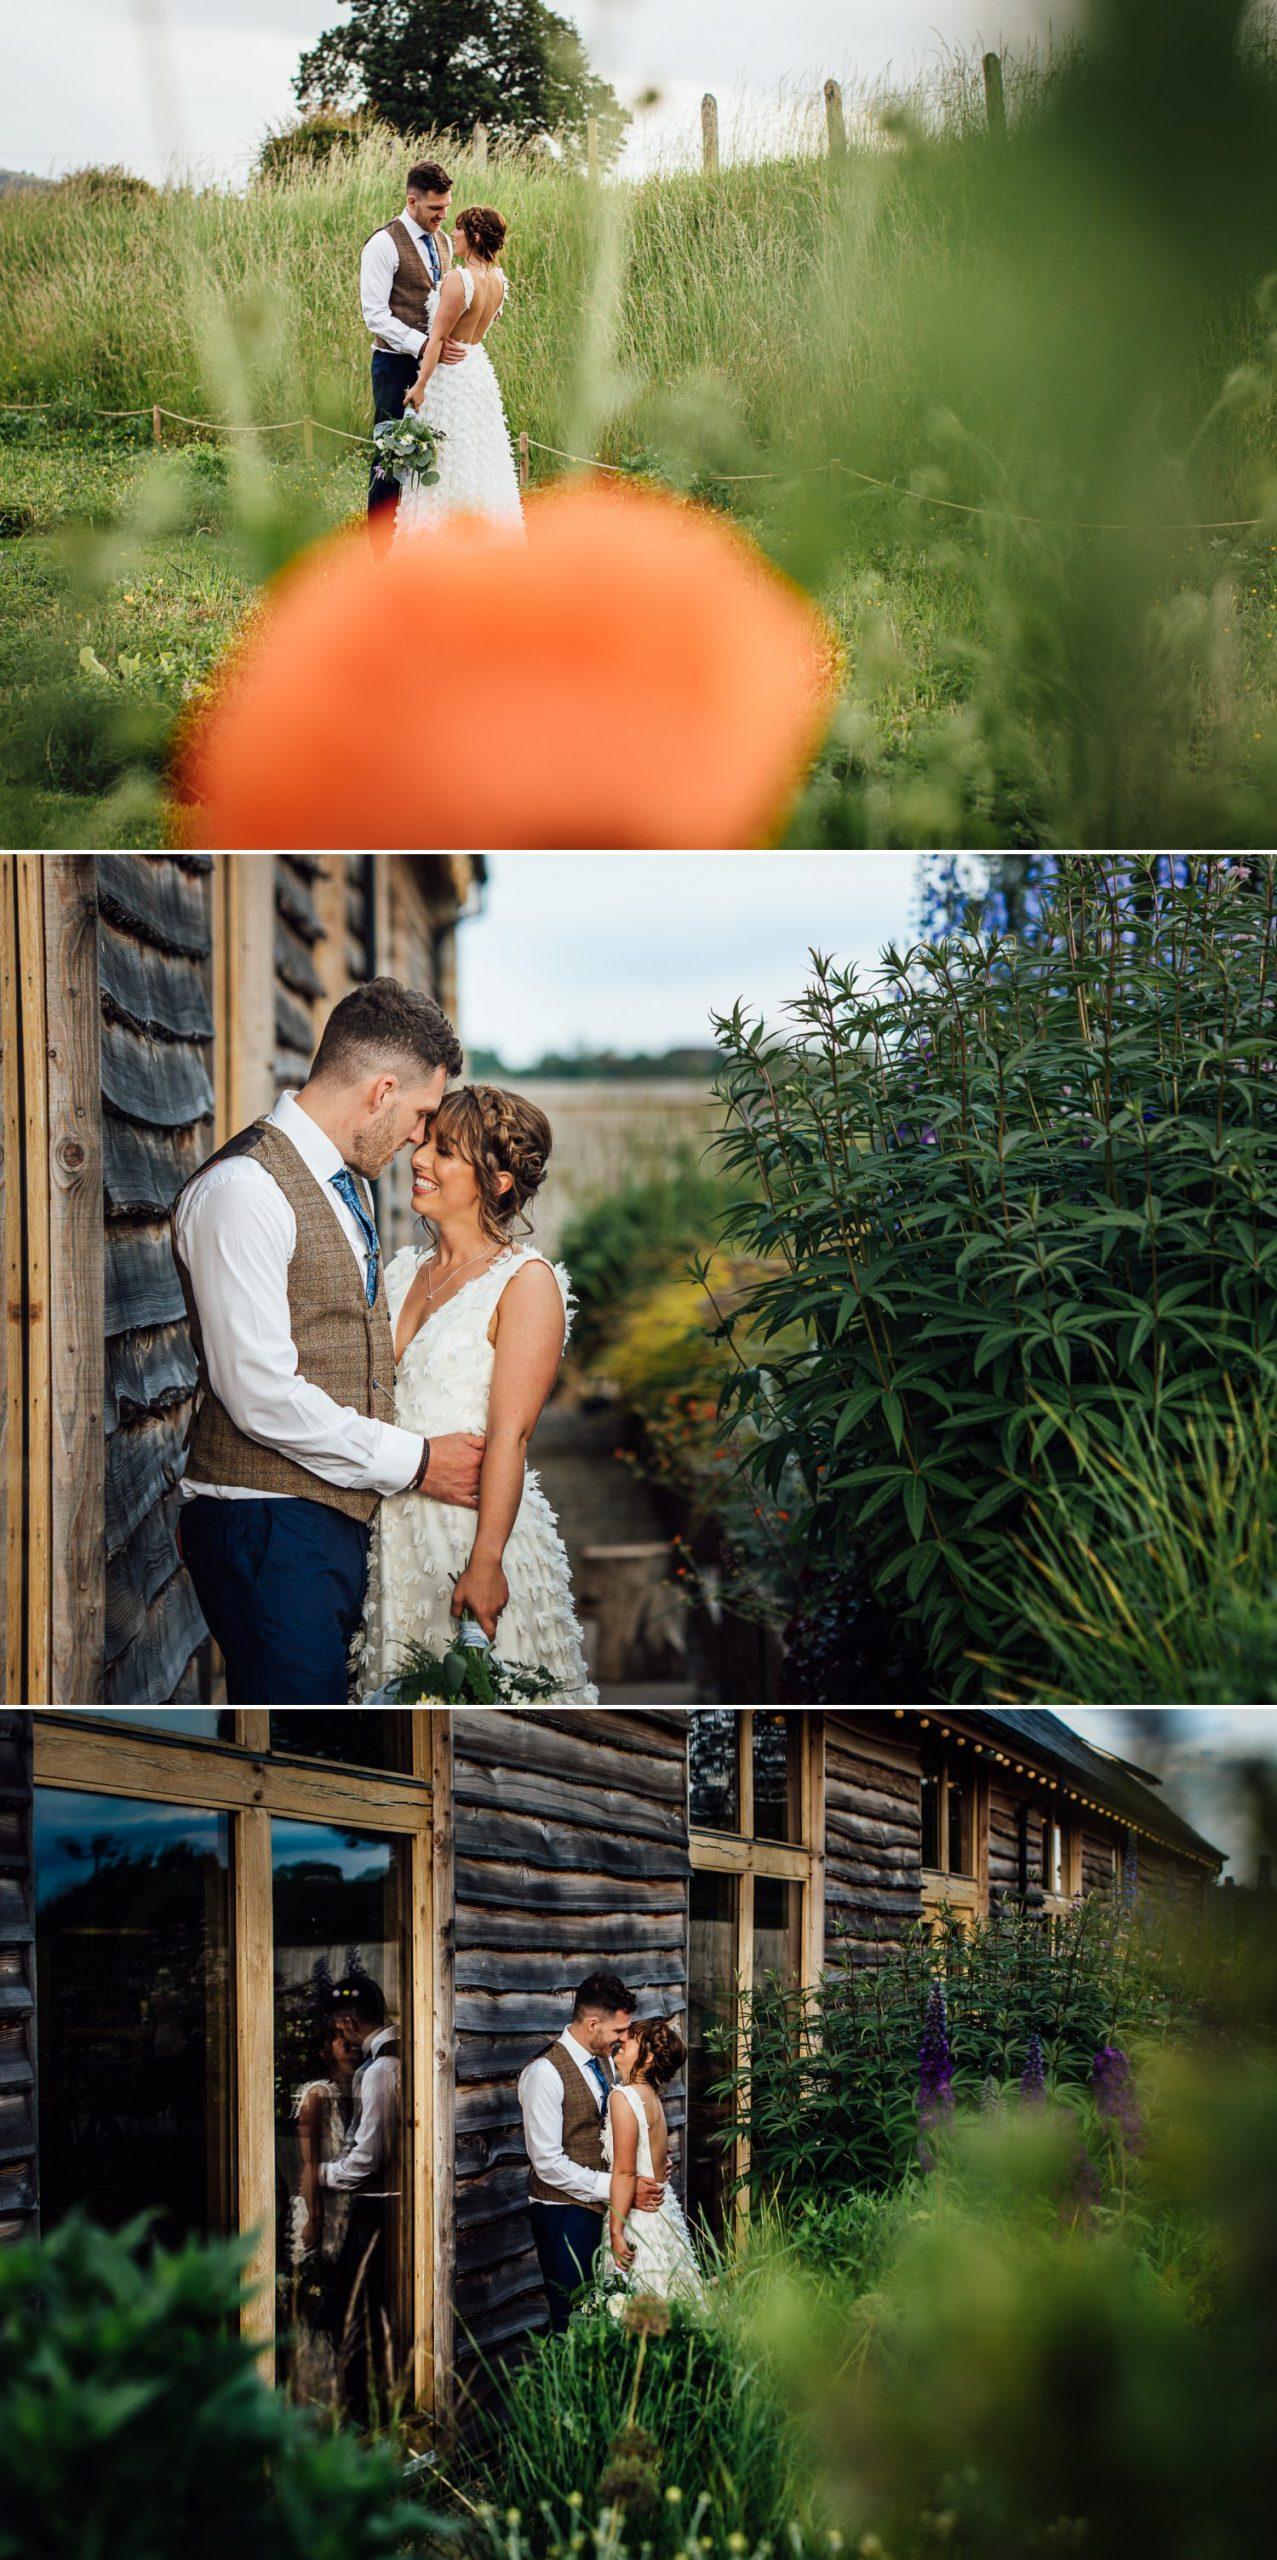 evening wedding couple photographs